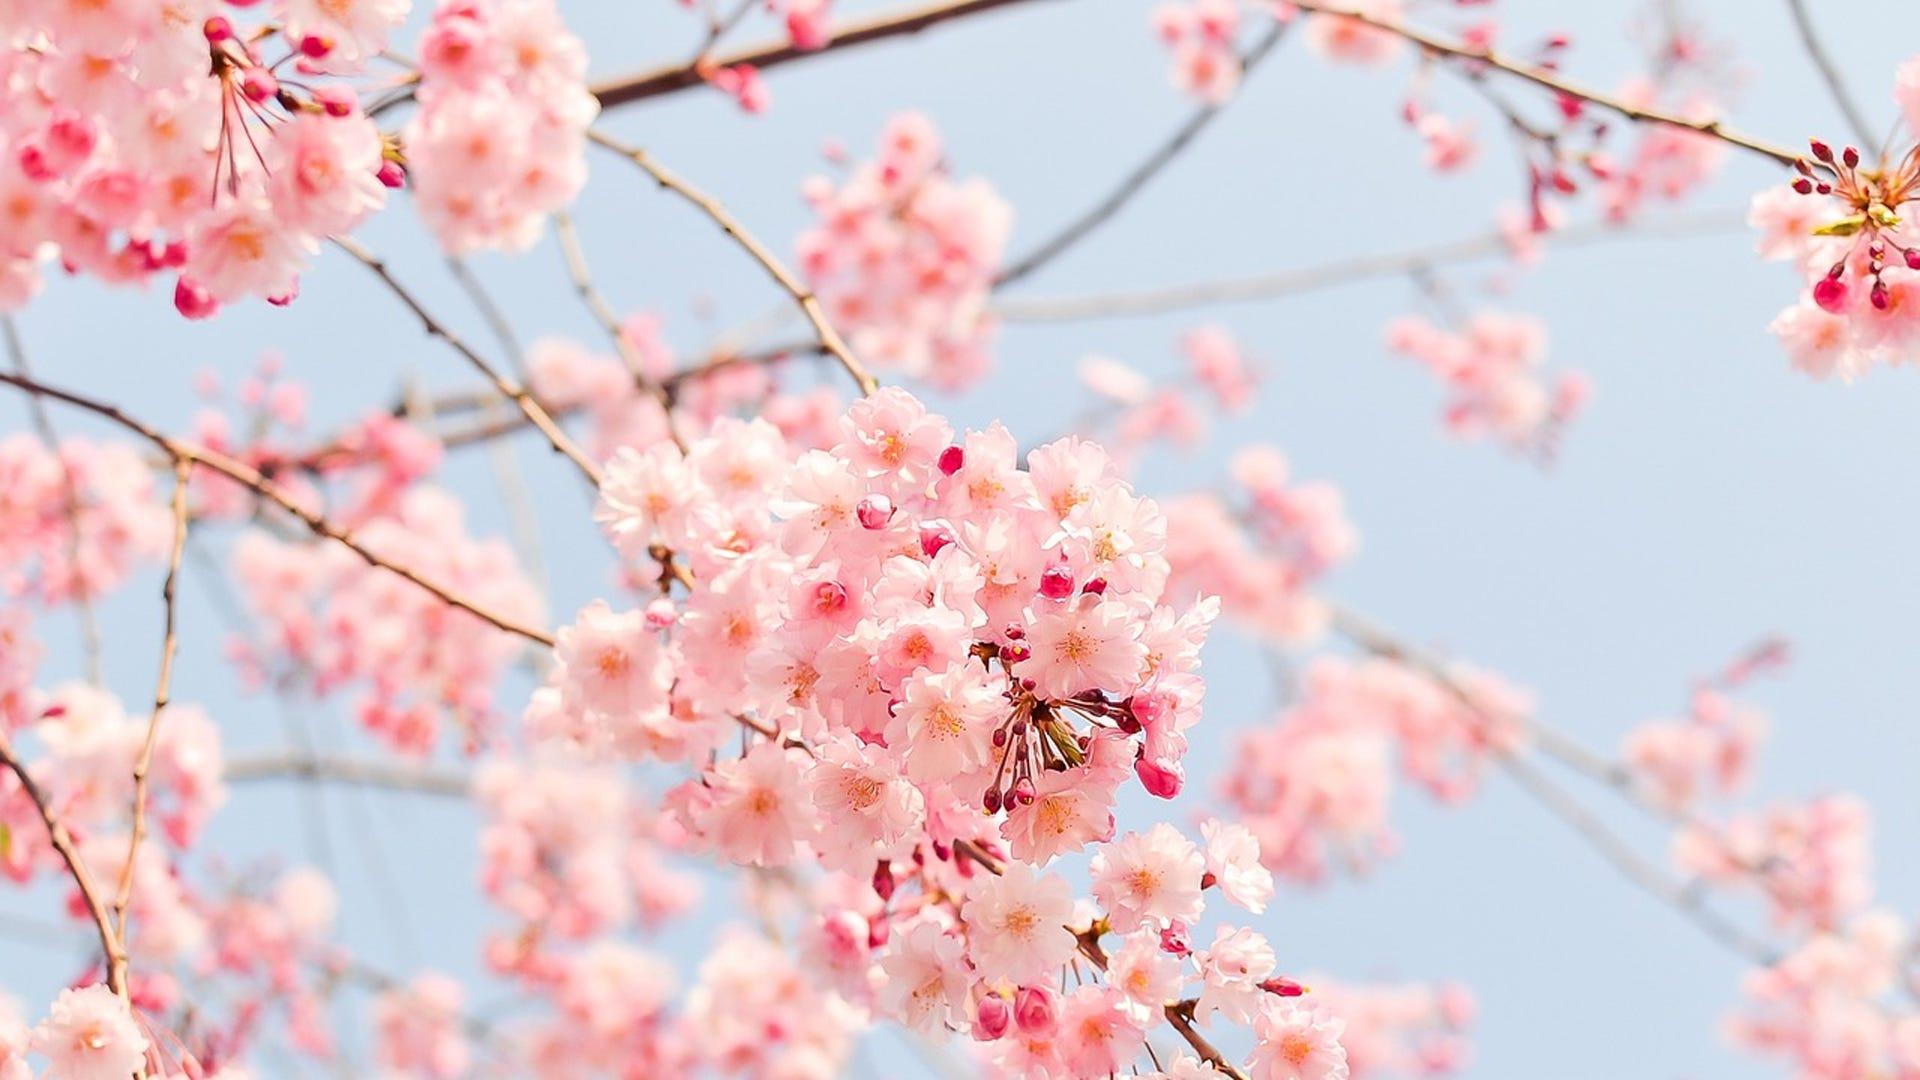 The Best Spring Photos On Instagram